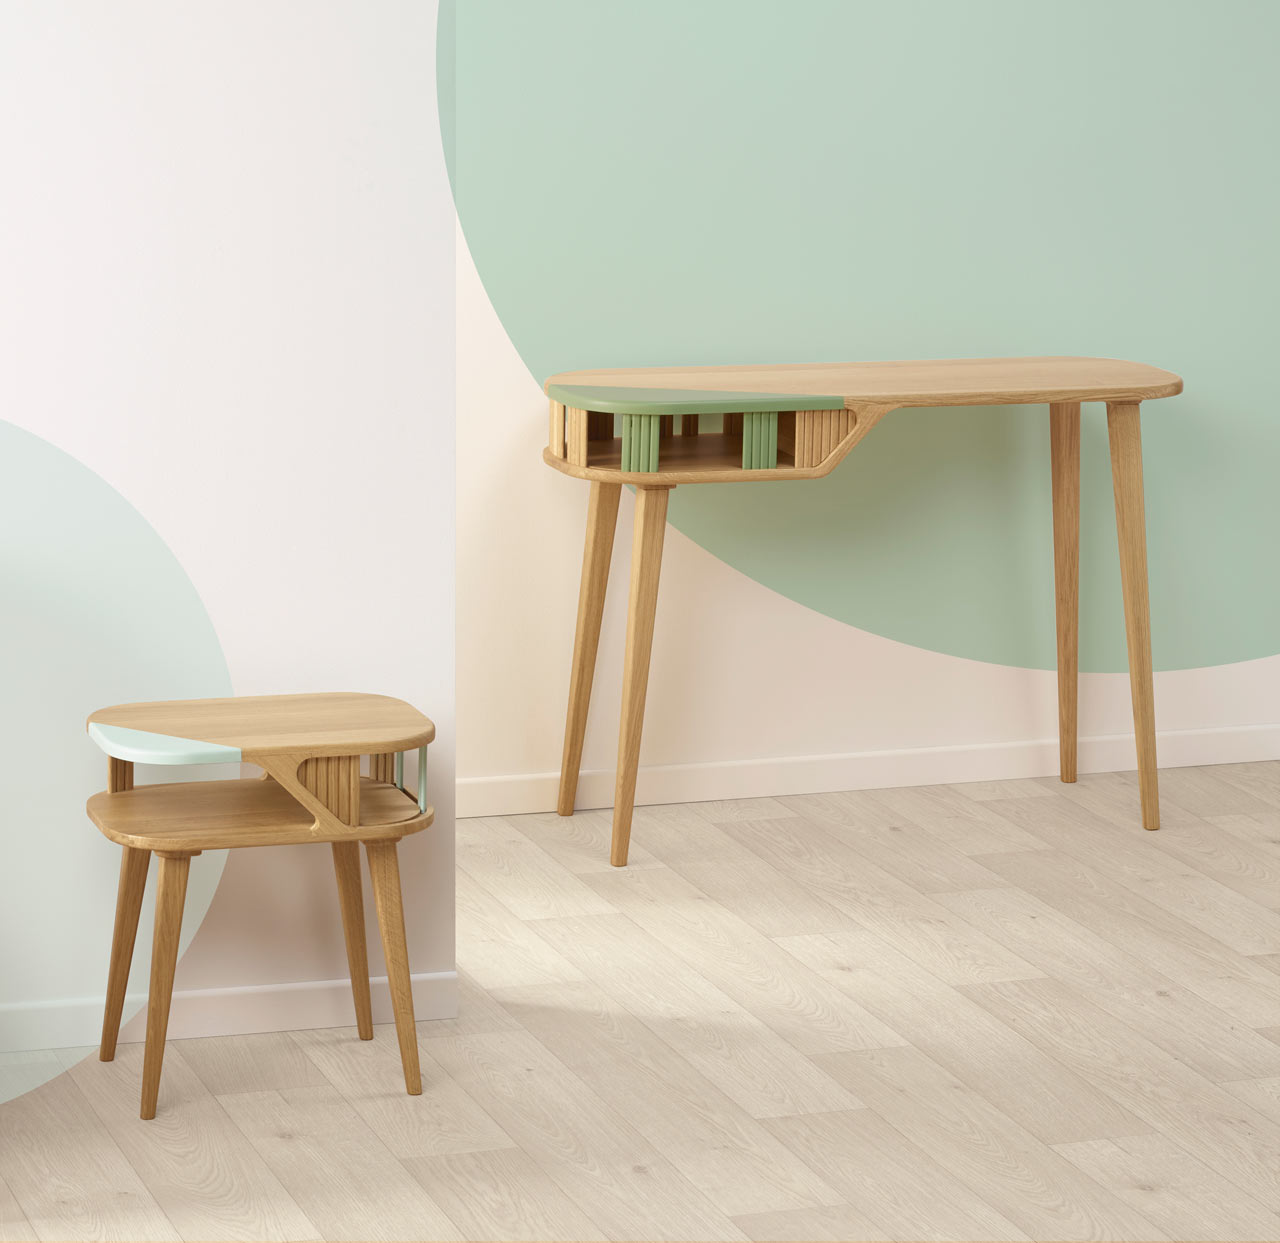 Julie-Gaillard-Latitude-Furniture-hisheji (5)